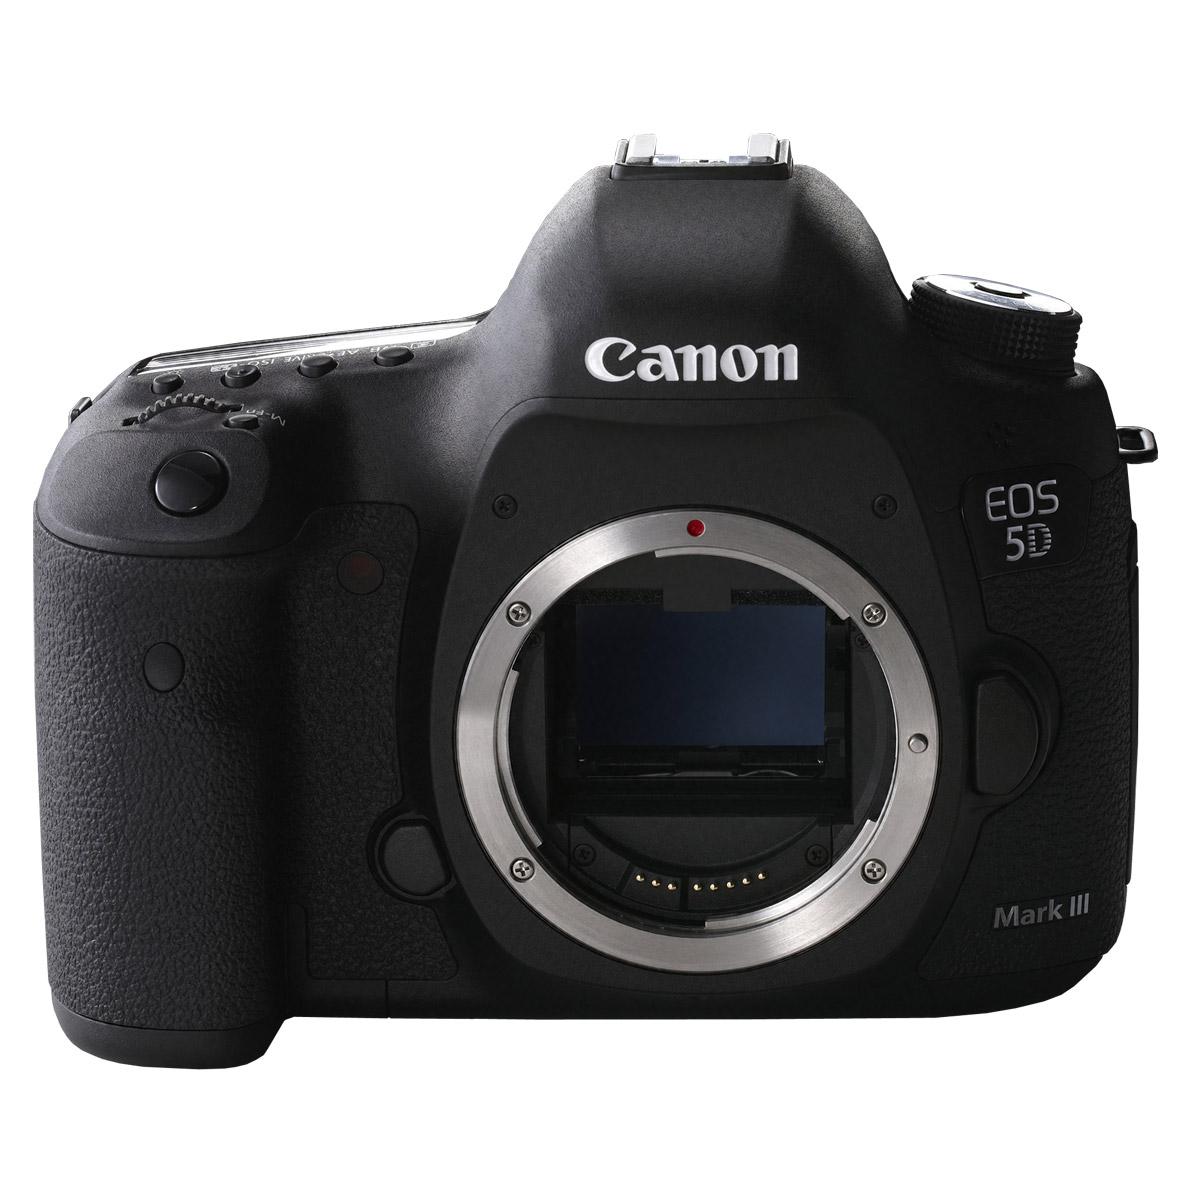 canon eos 5d mark iii appareil photo reflex canon sur. Black Bedroom Furniture Sets. Home Design Ideas